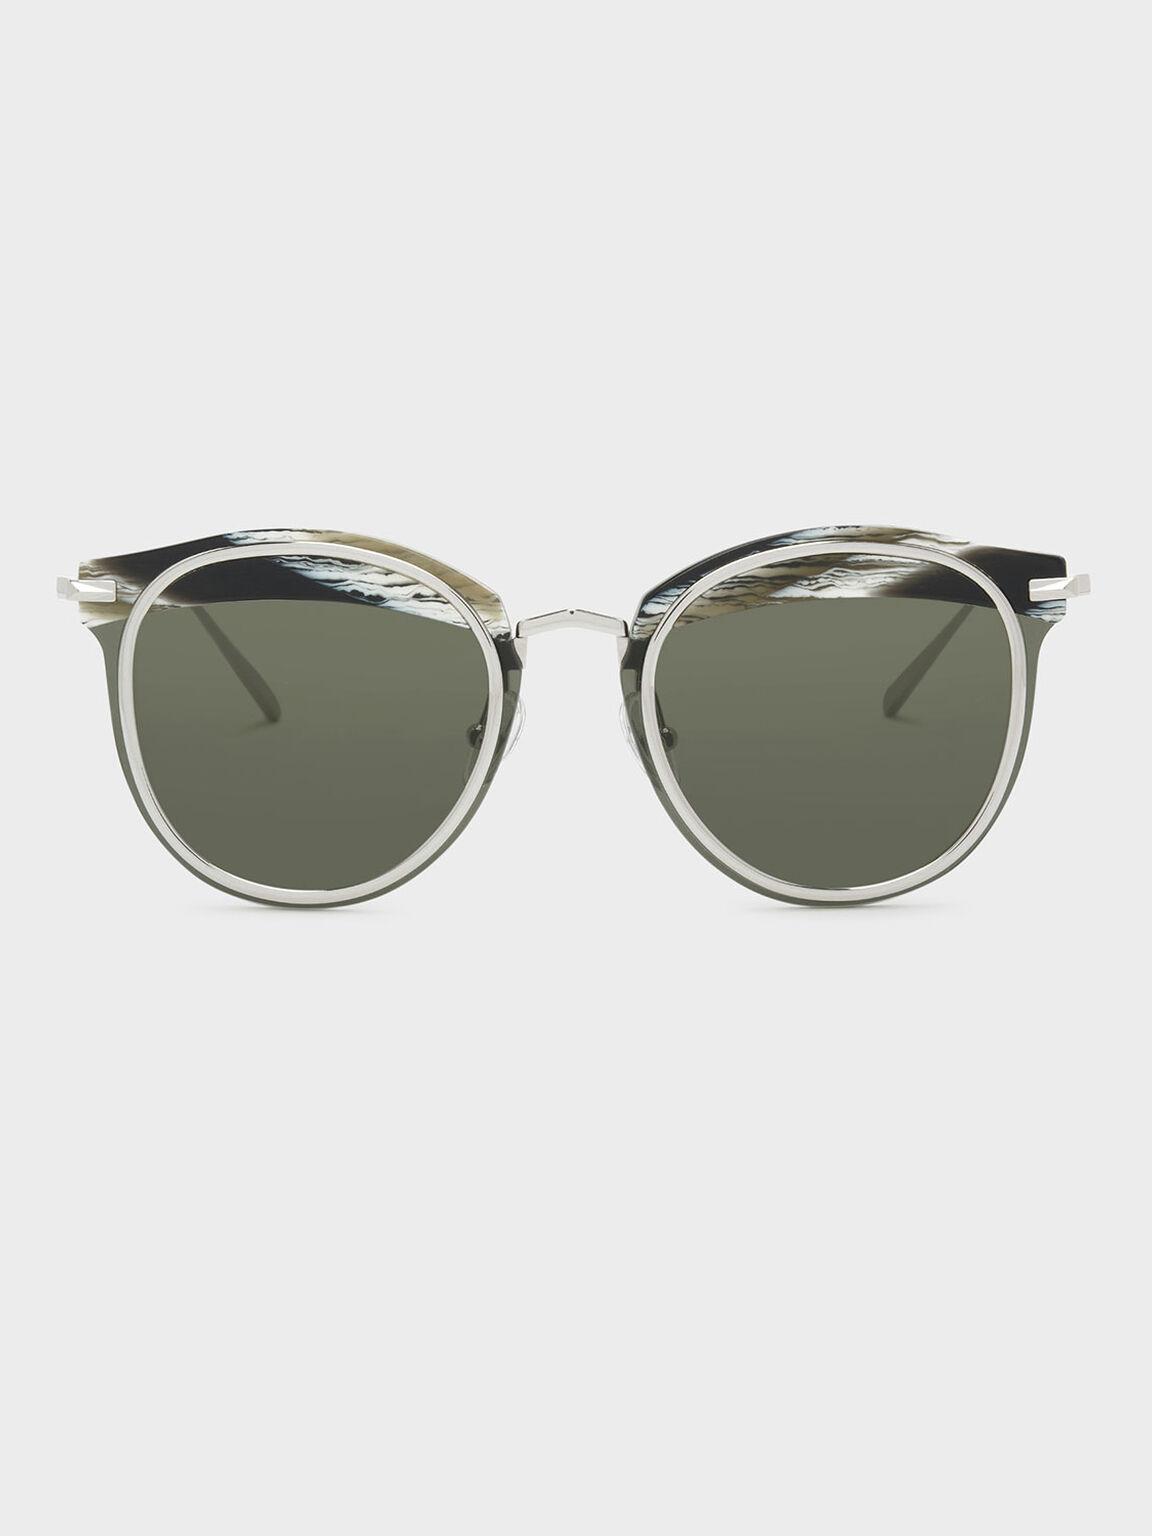 Acetate Frame Sunglasses, Grey, hi-res